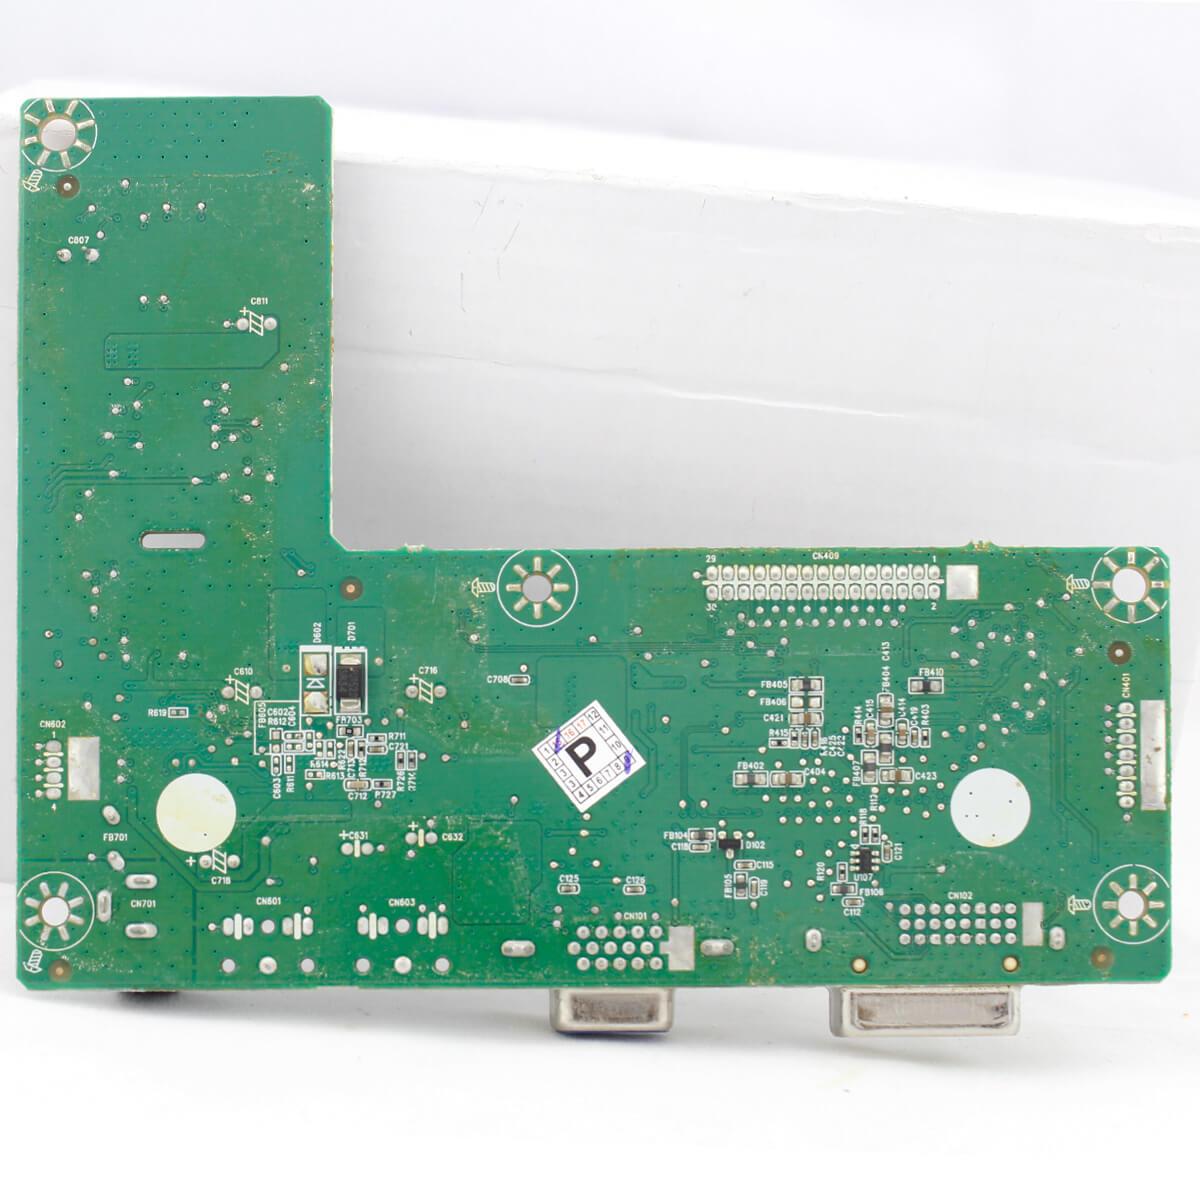 Placa de Sinal Monitor AOC E2034F Pn 715G4134-M03-BRA-004k - Nova